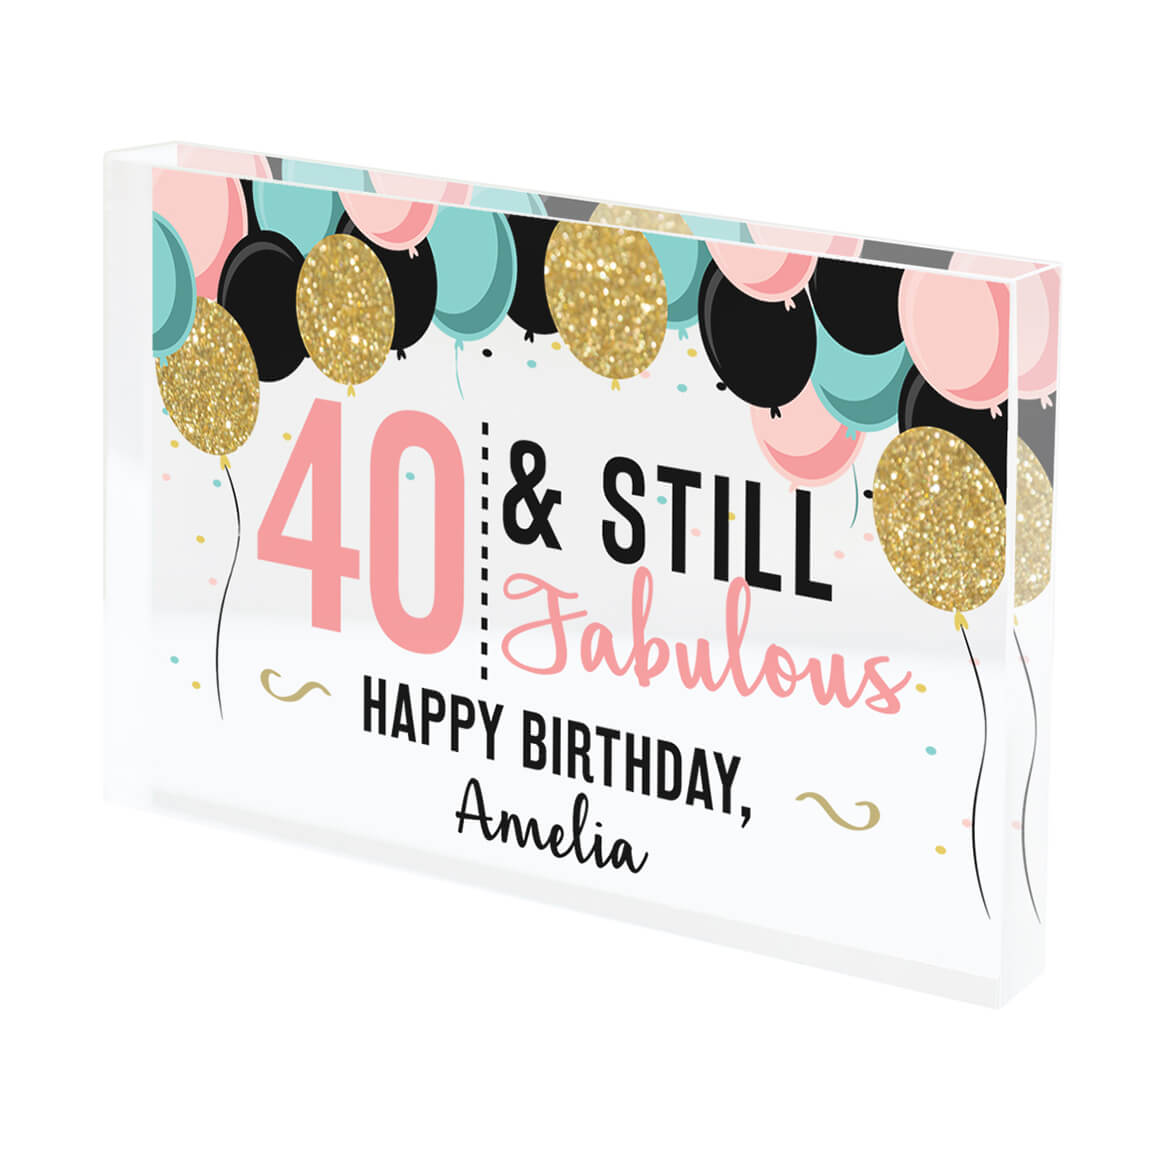 Personalized Acrylic Block Birthday Keepsake